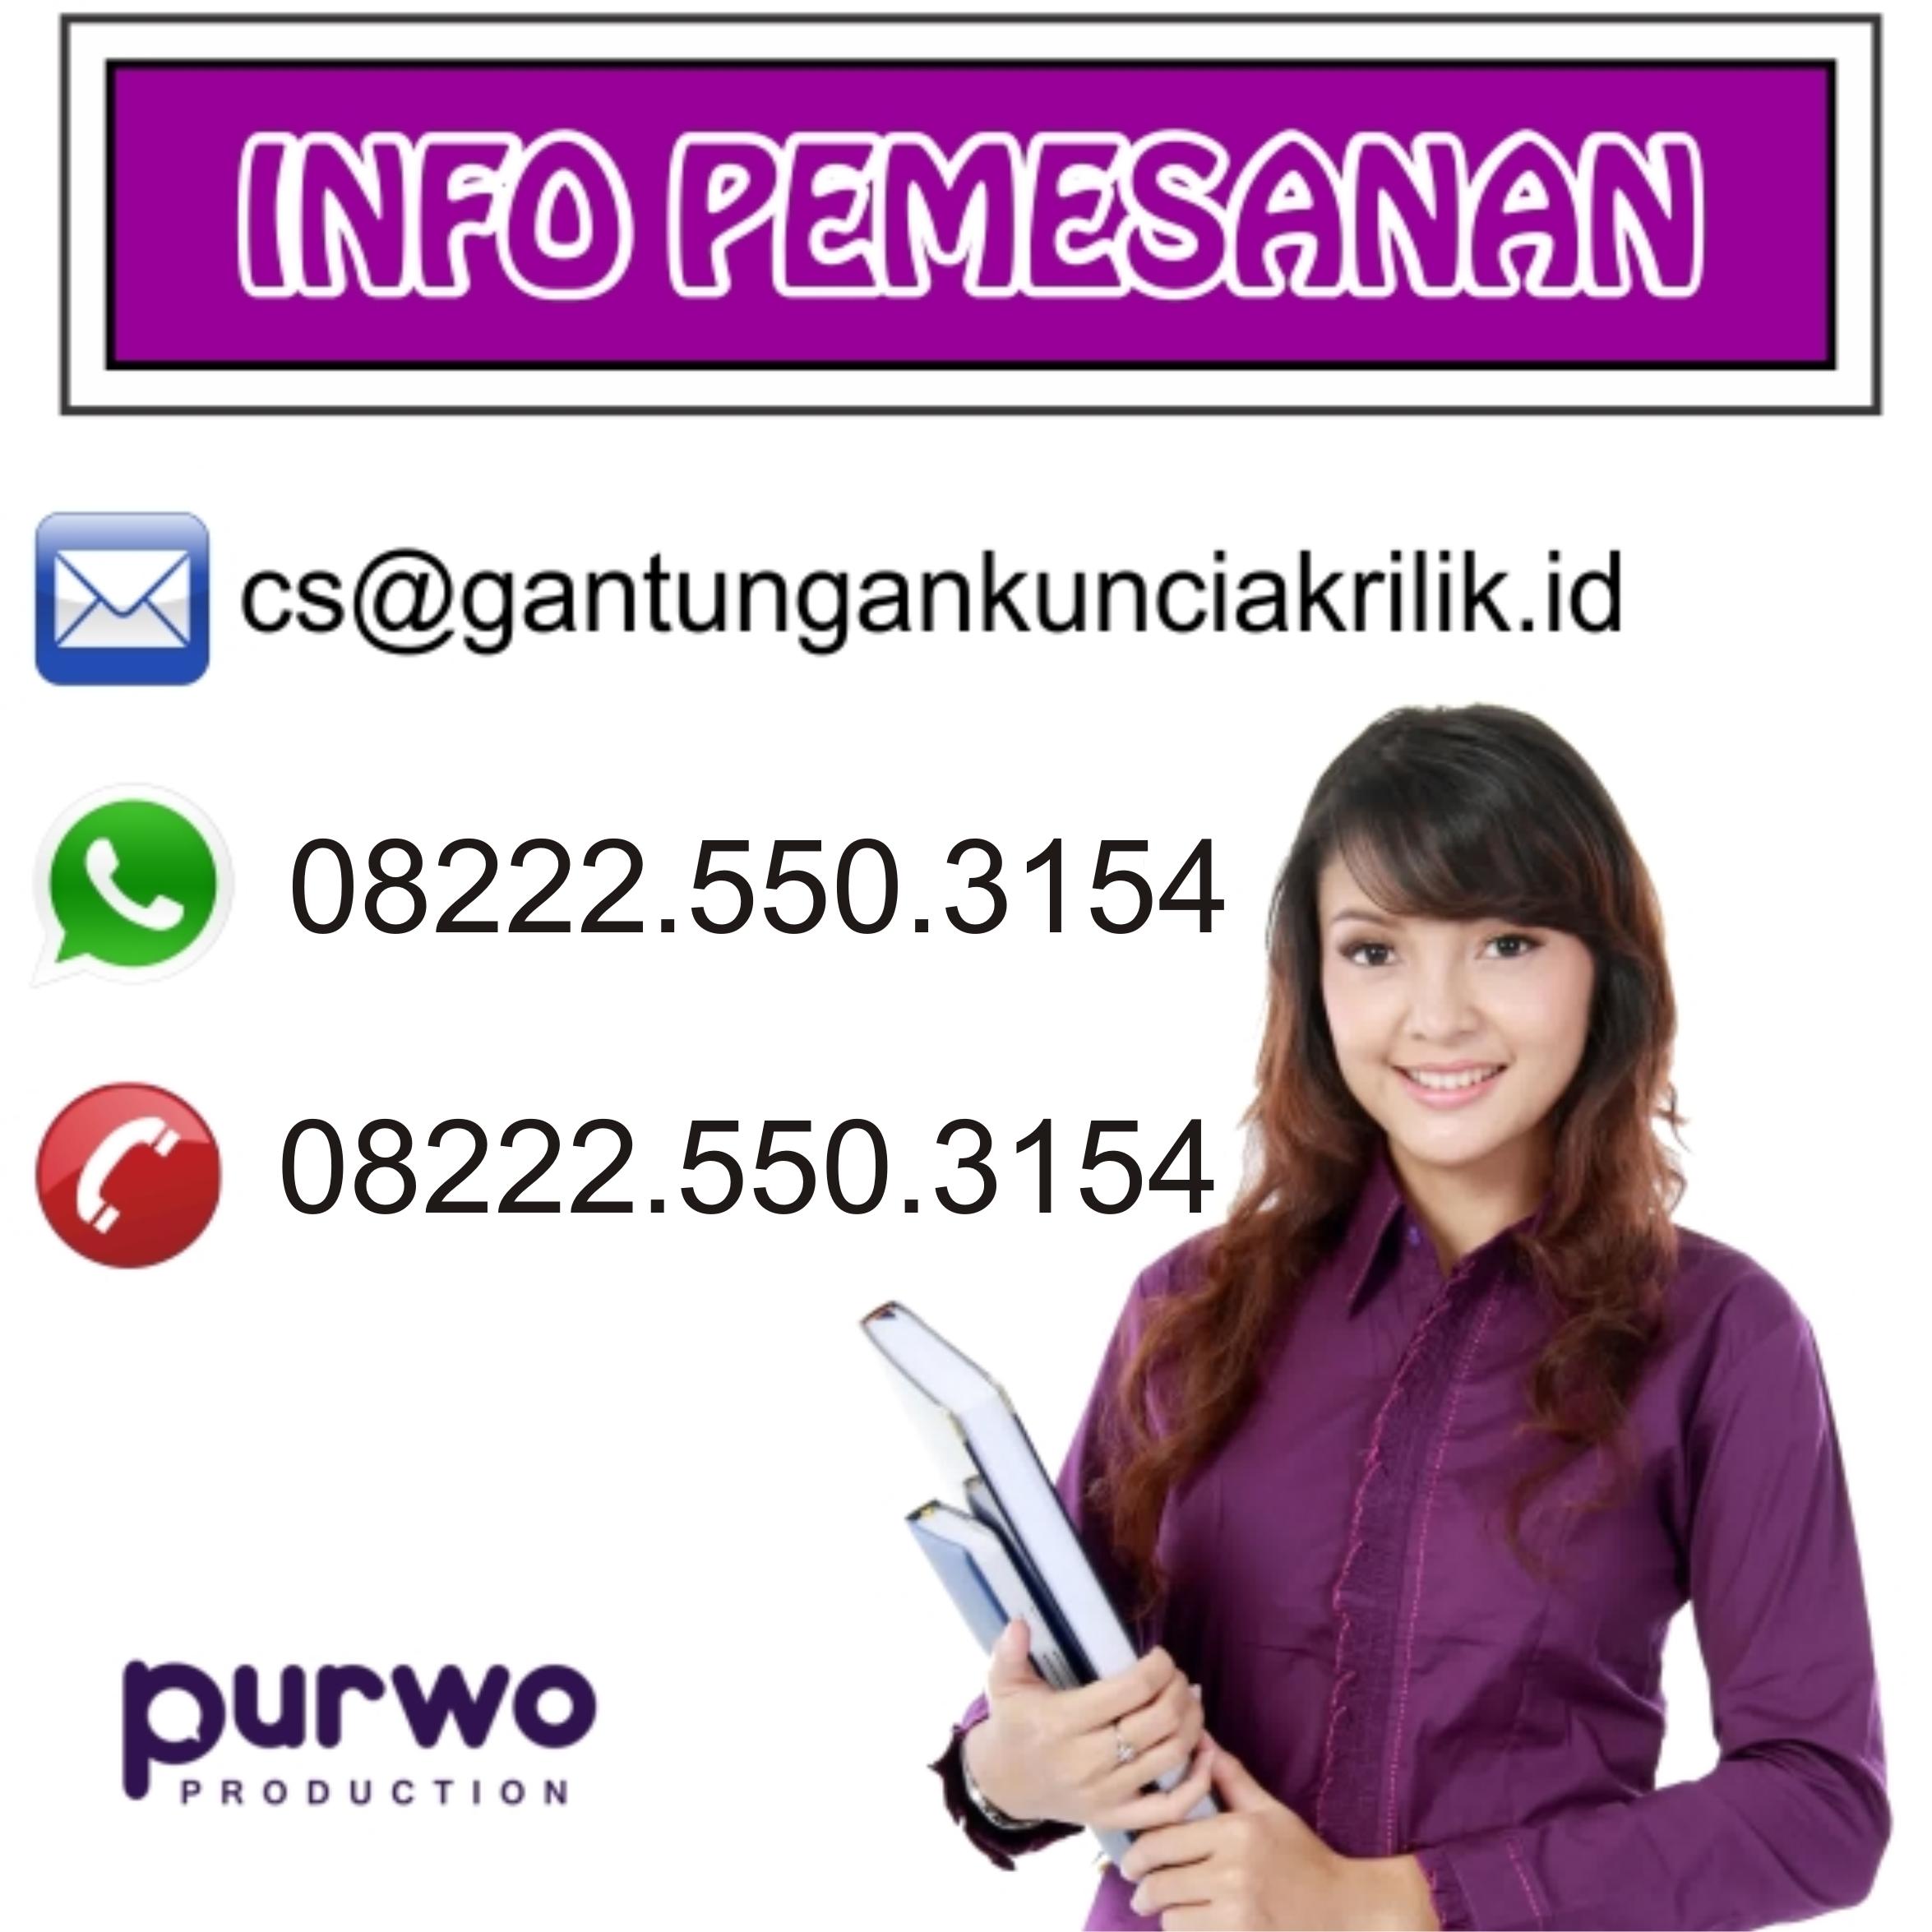 Pesan Gantungan Kunci Akrilik Anime Di Jakarta Pusat